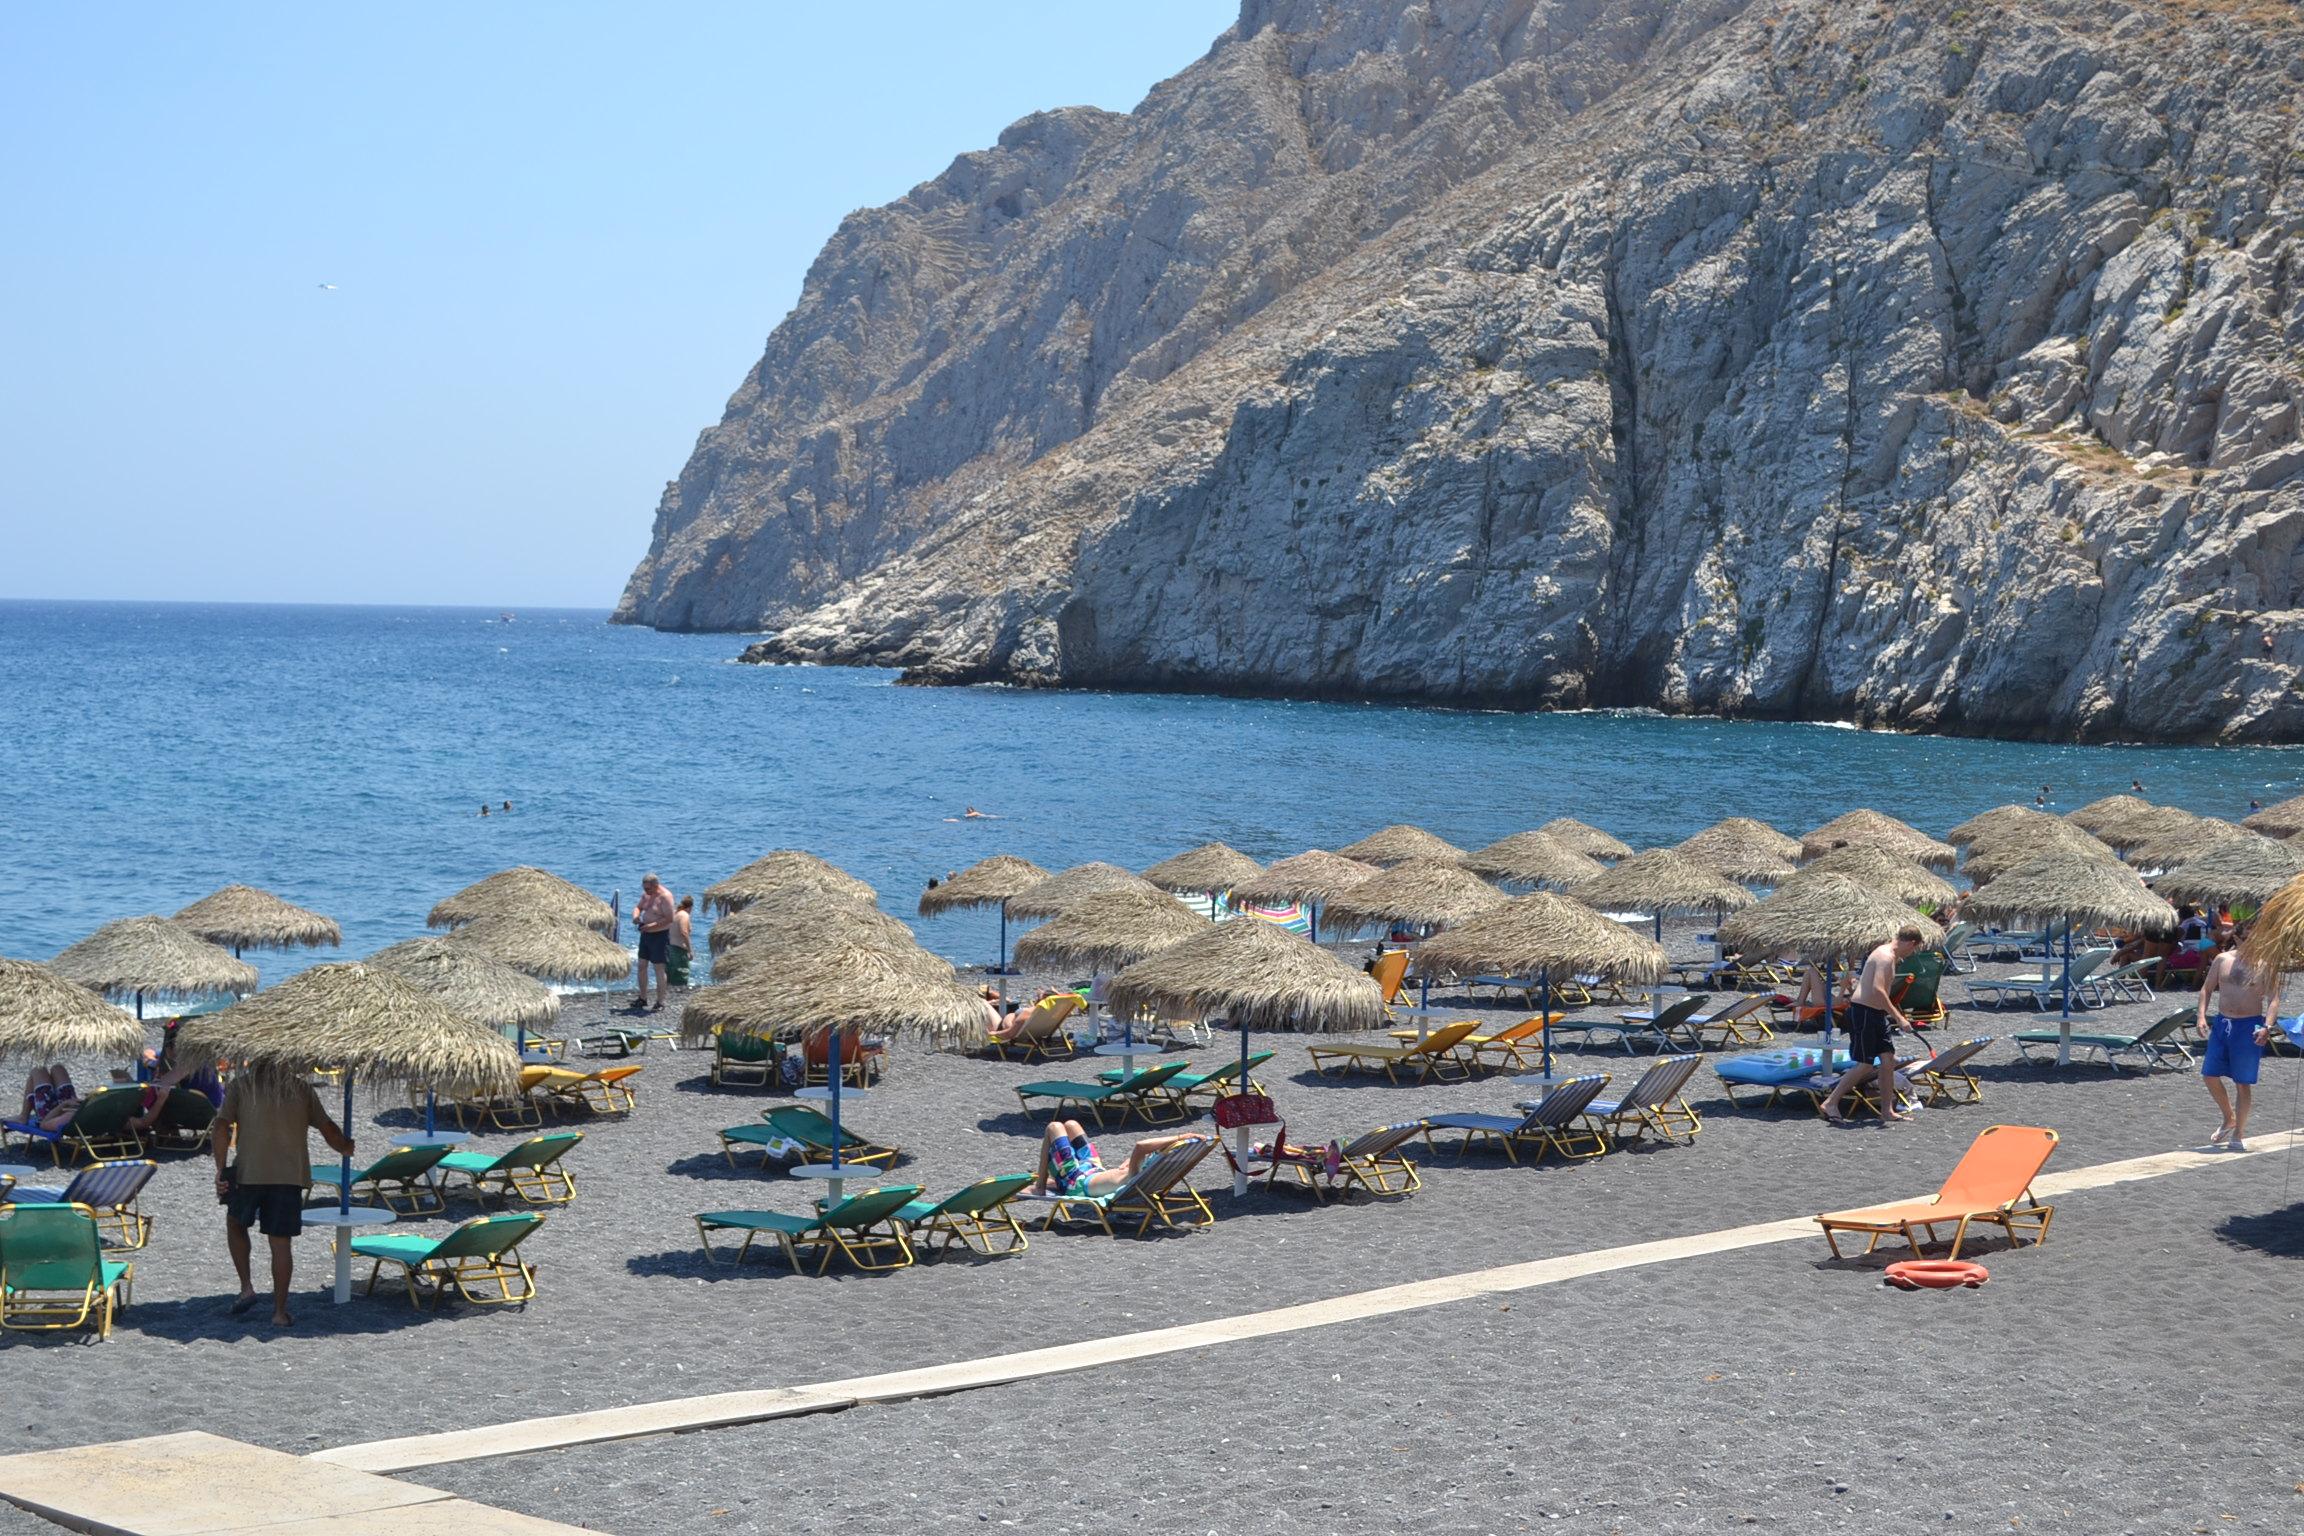 Travelpass.gr - Οι 10 εντυπωσιακότερες παραλίες της Σαντορίνης